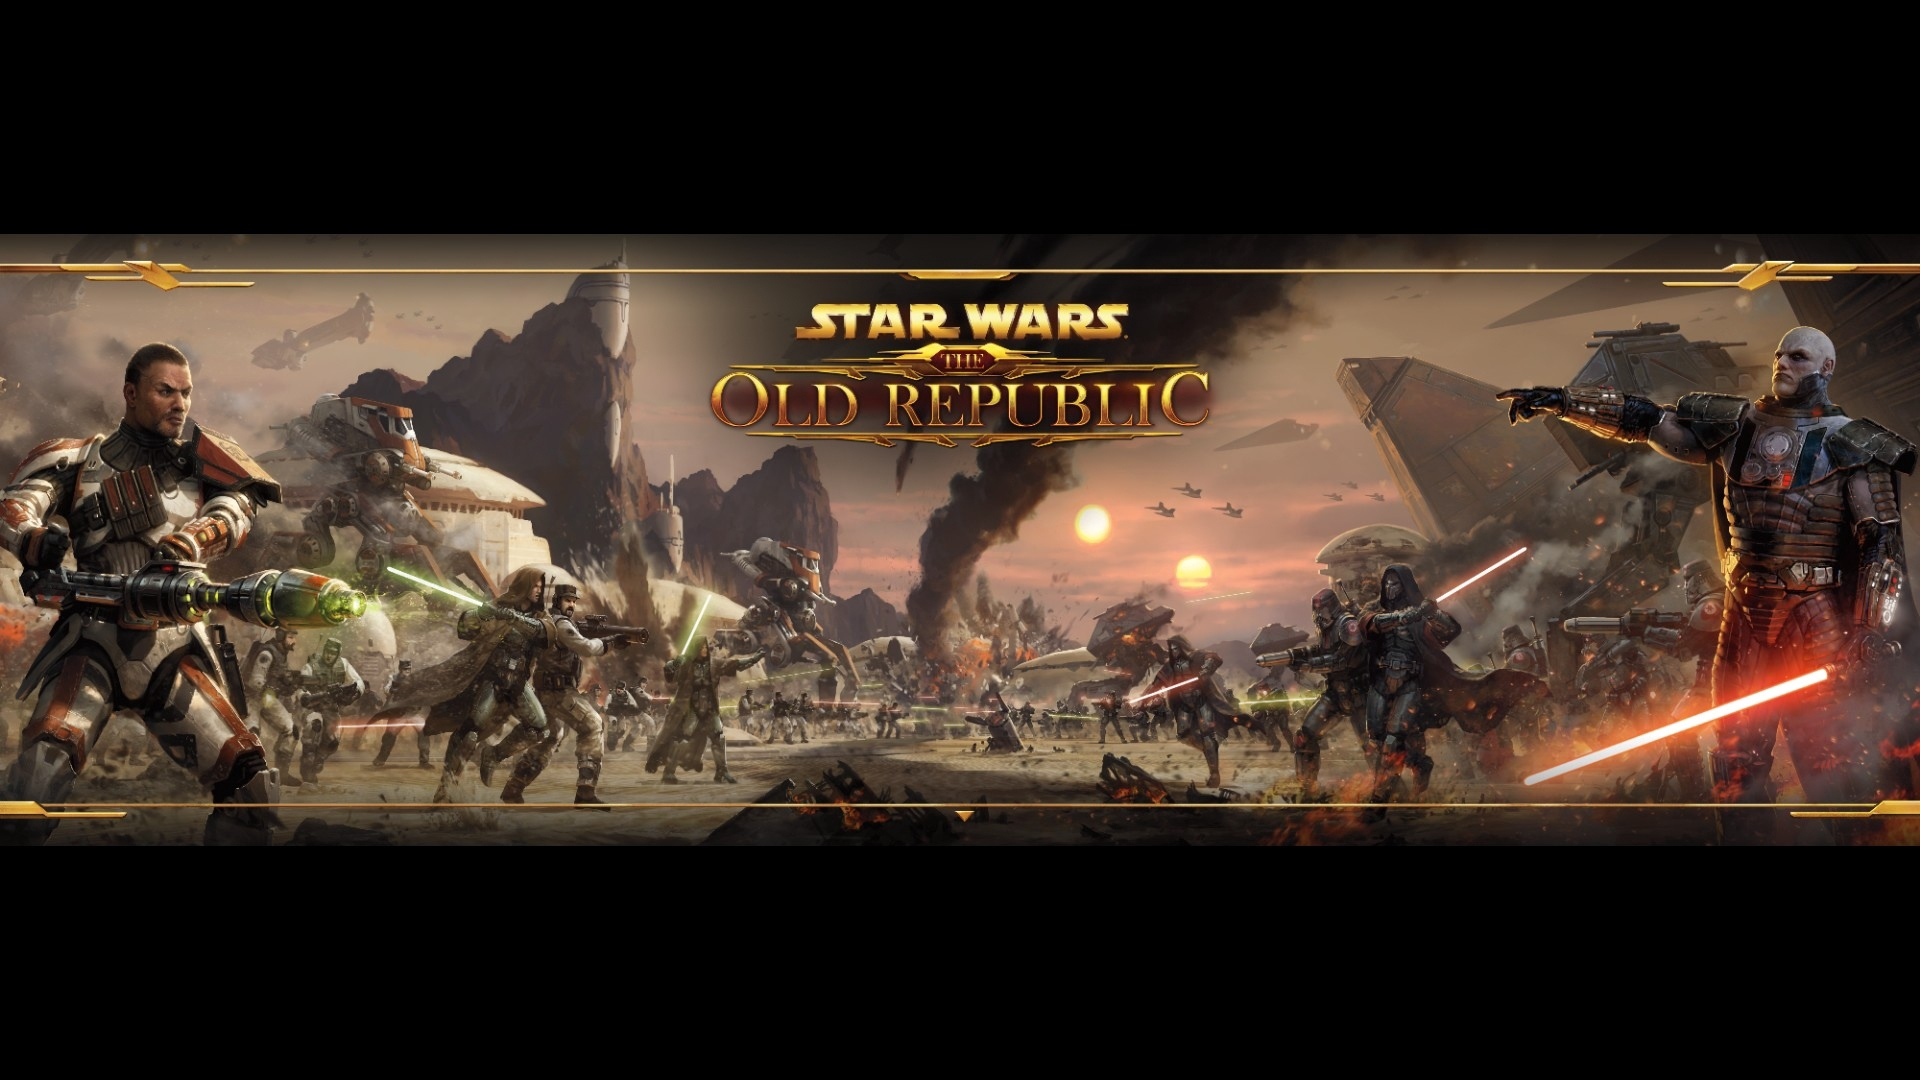 Download wallpaper 1920x1080 star wars the old republic battle 1920x1080